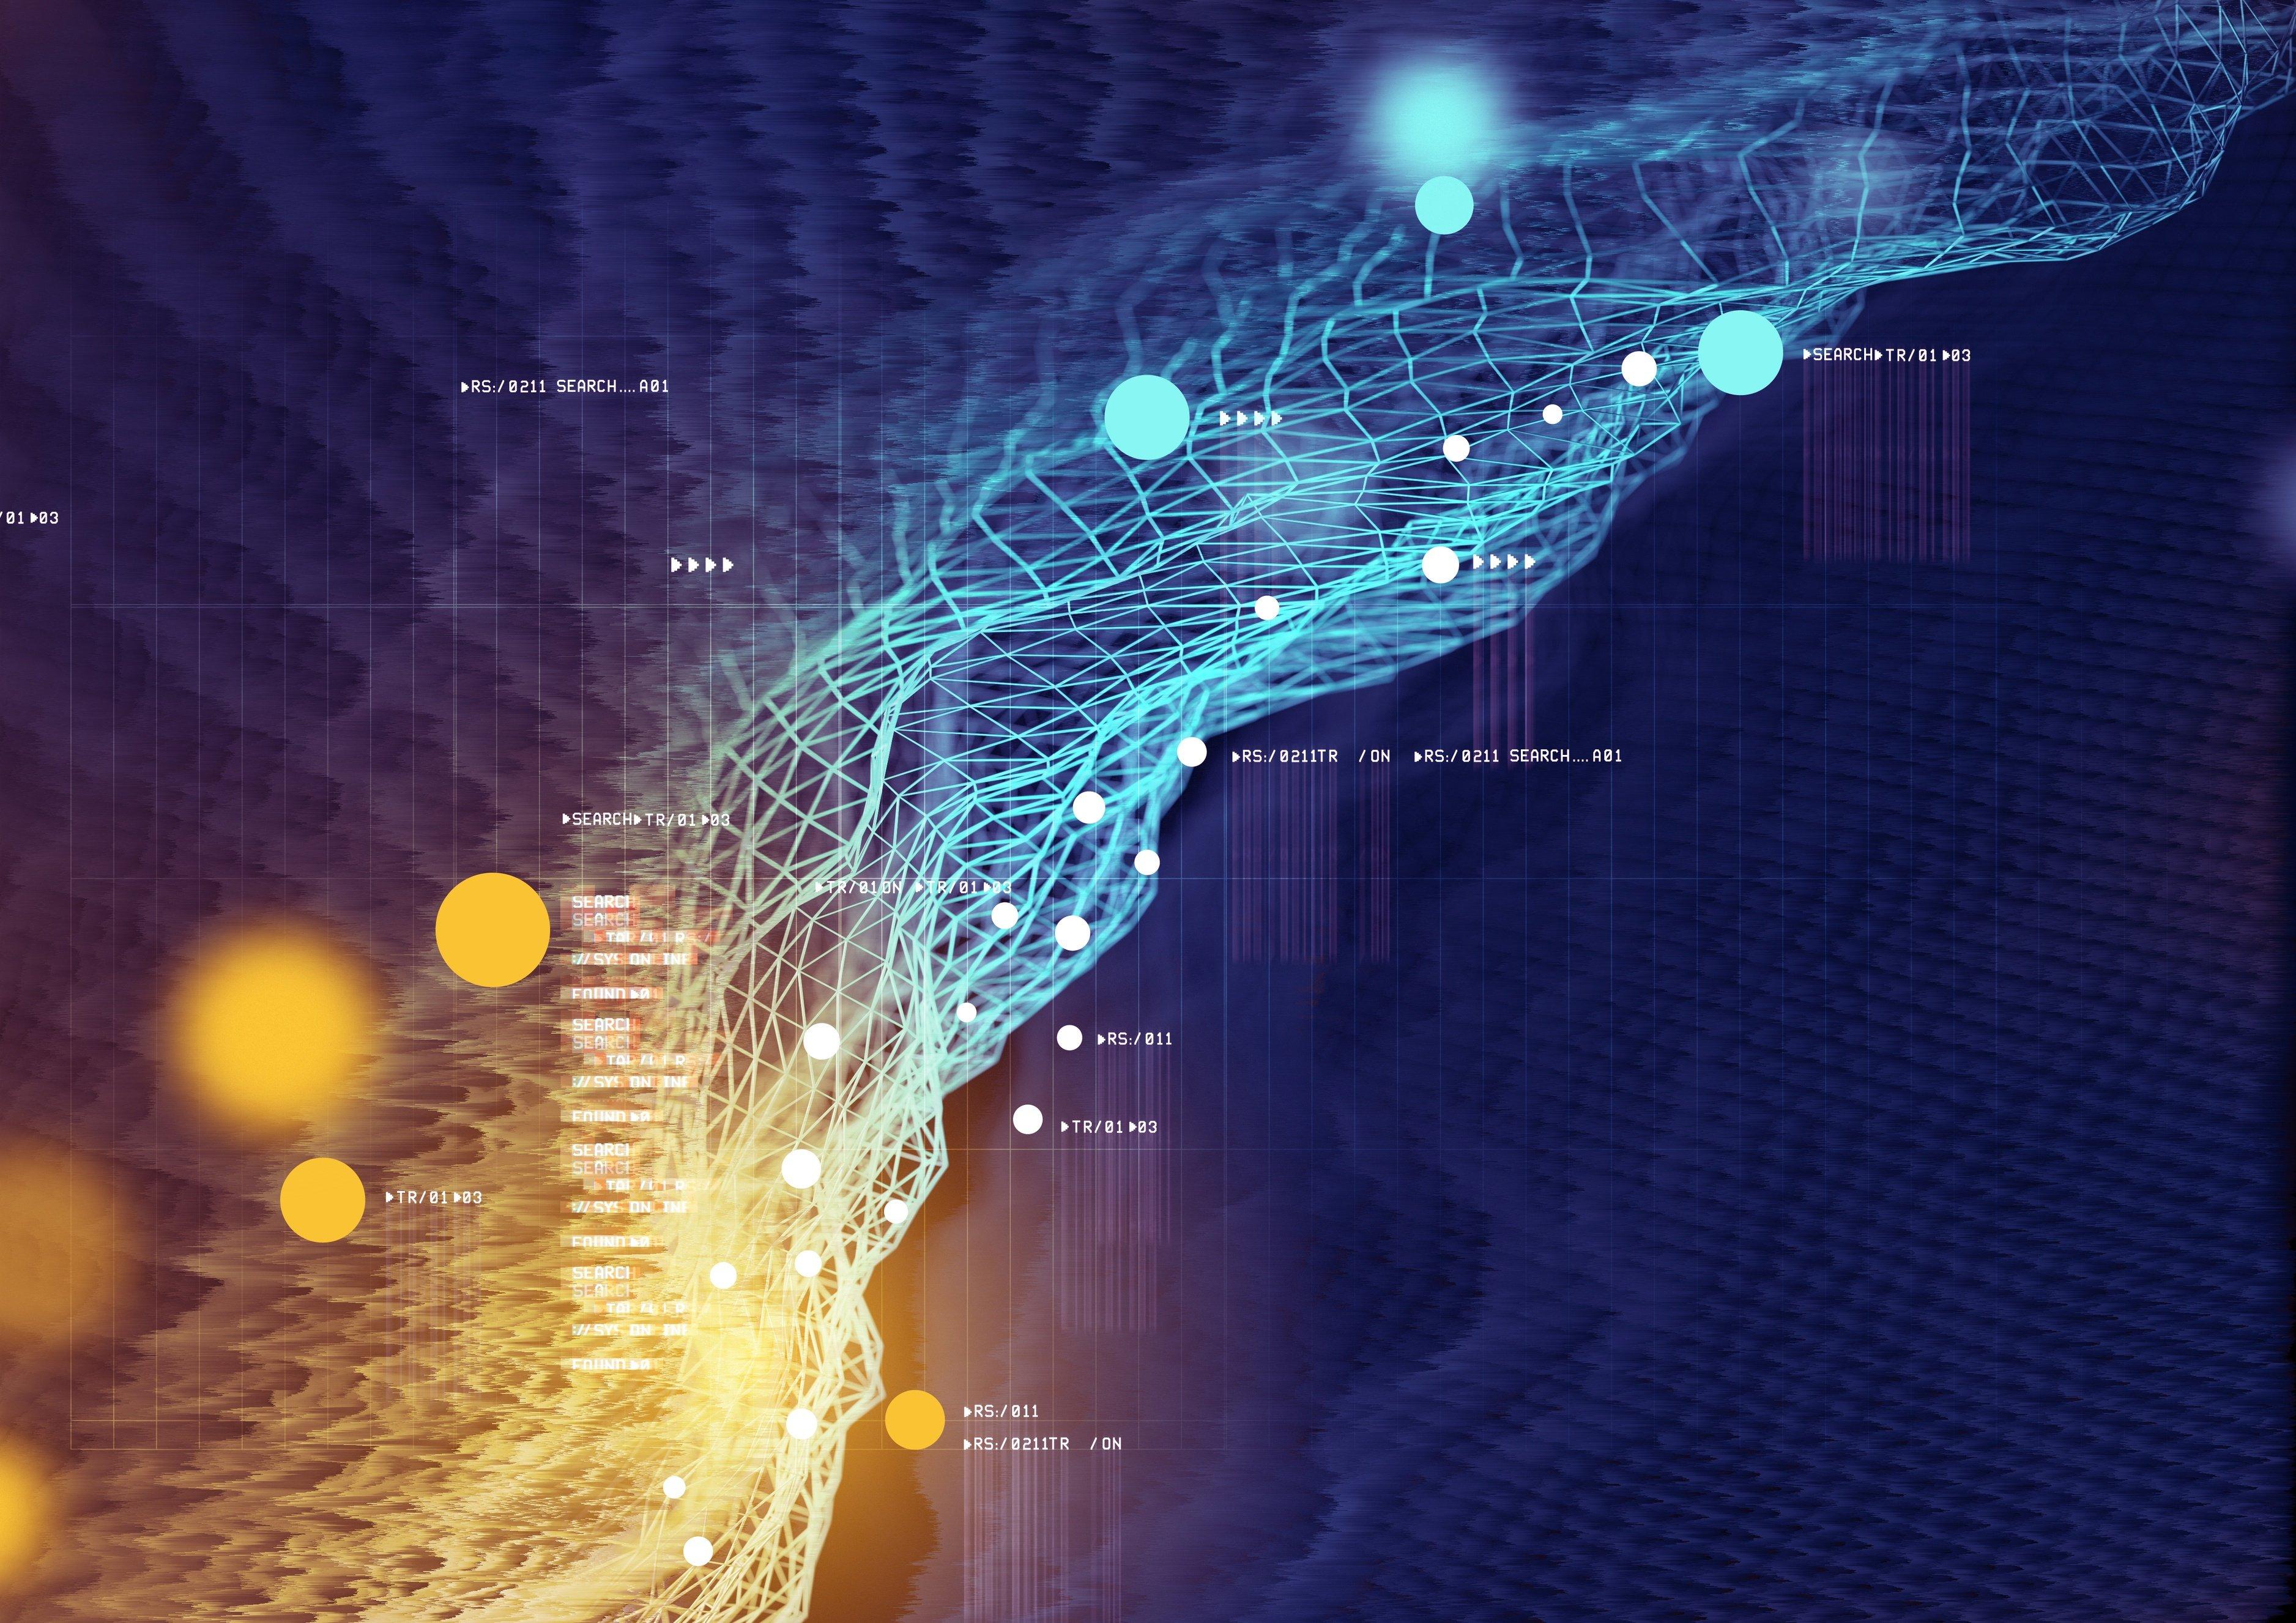 Data mining, analytics and visualization